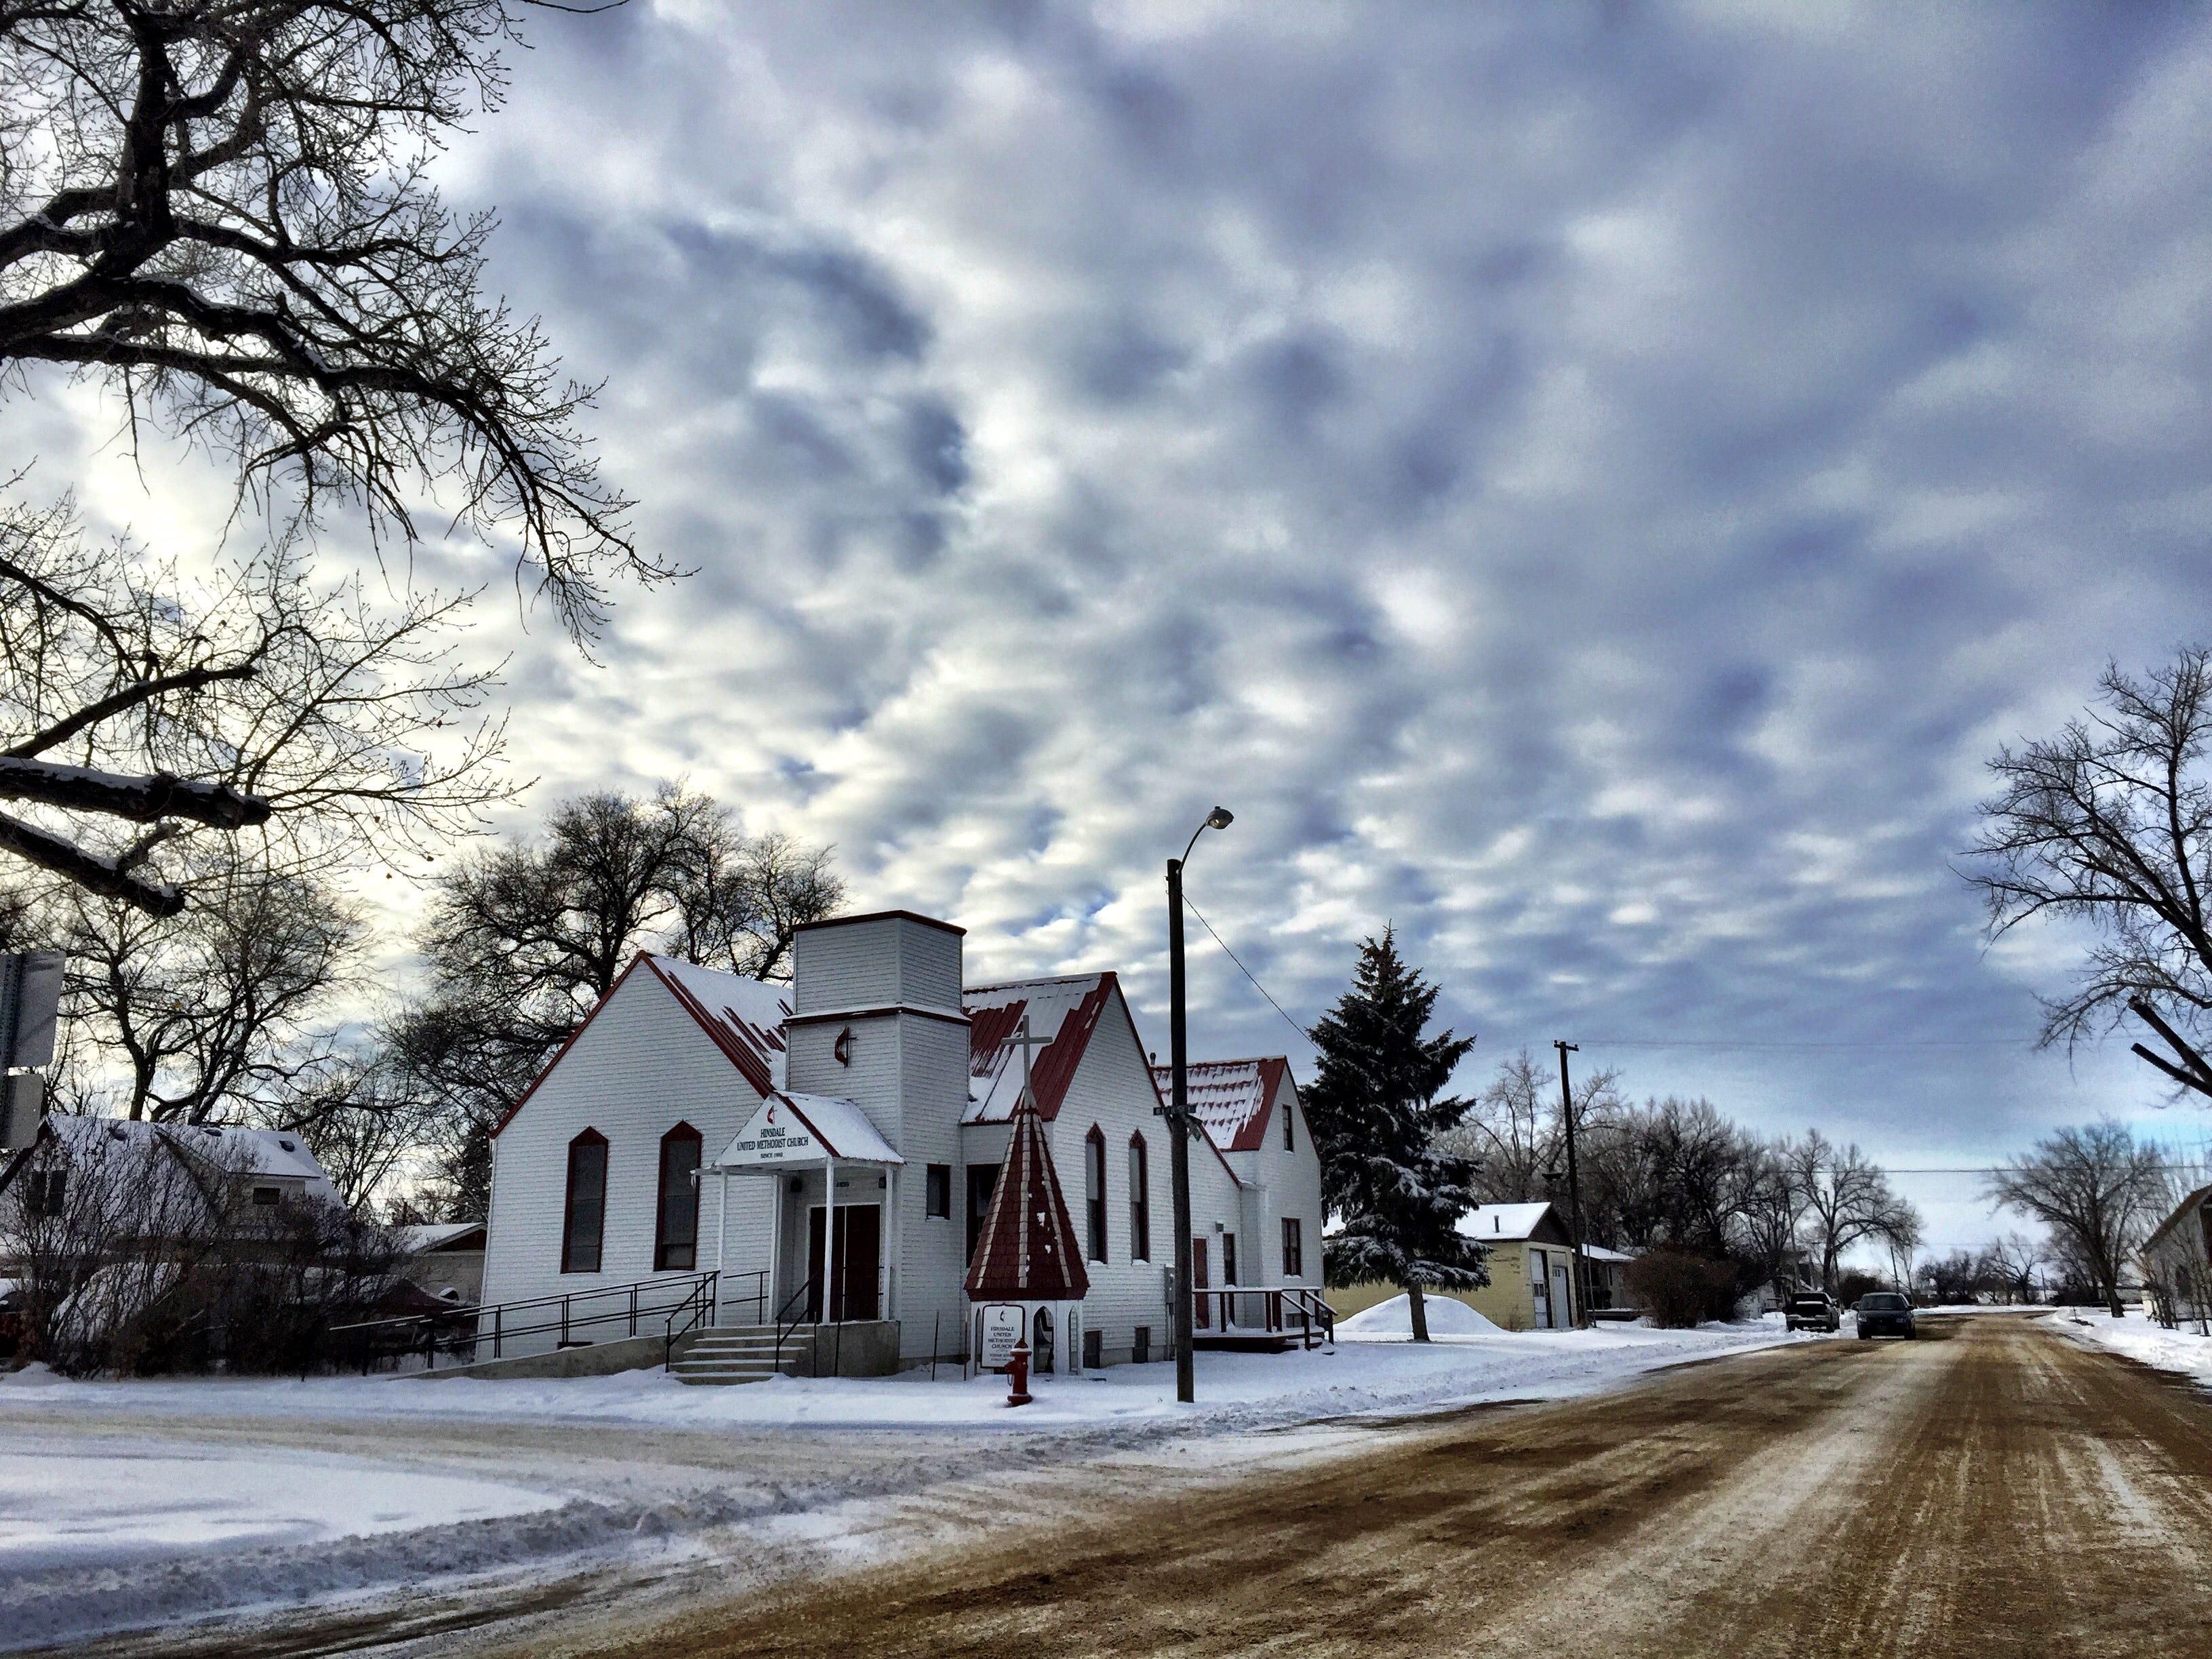 Hinsdale Methodist church